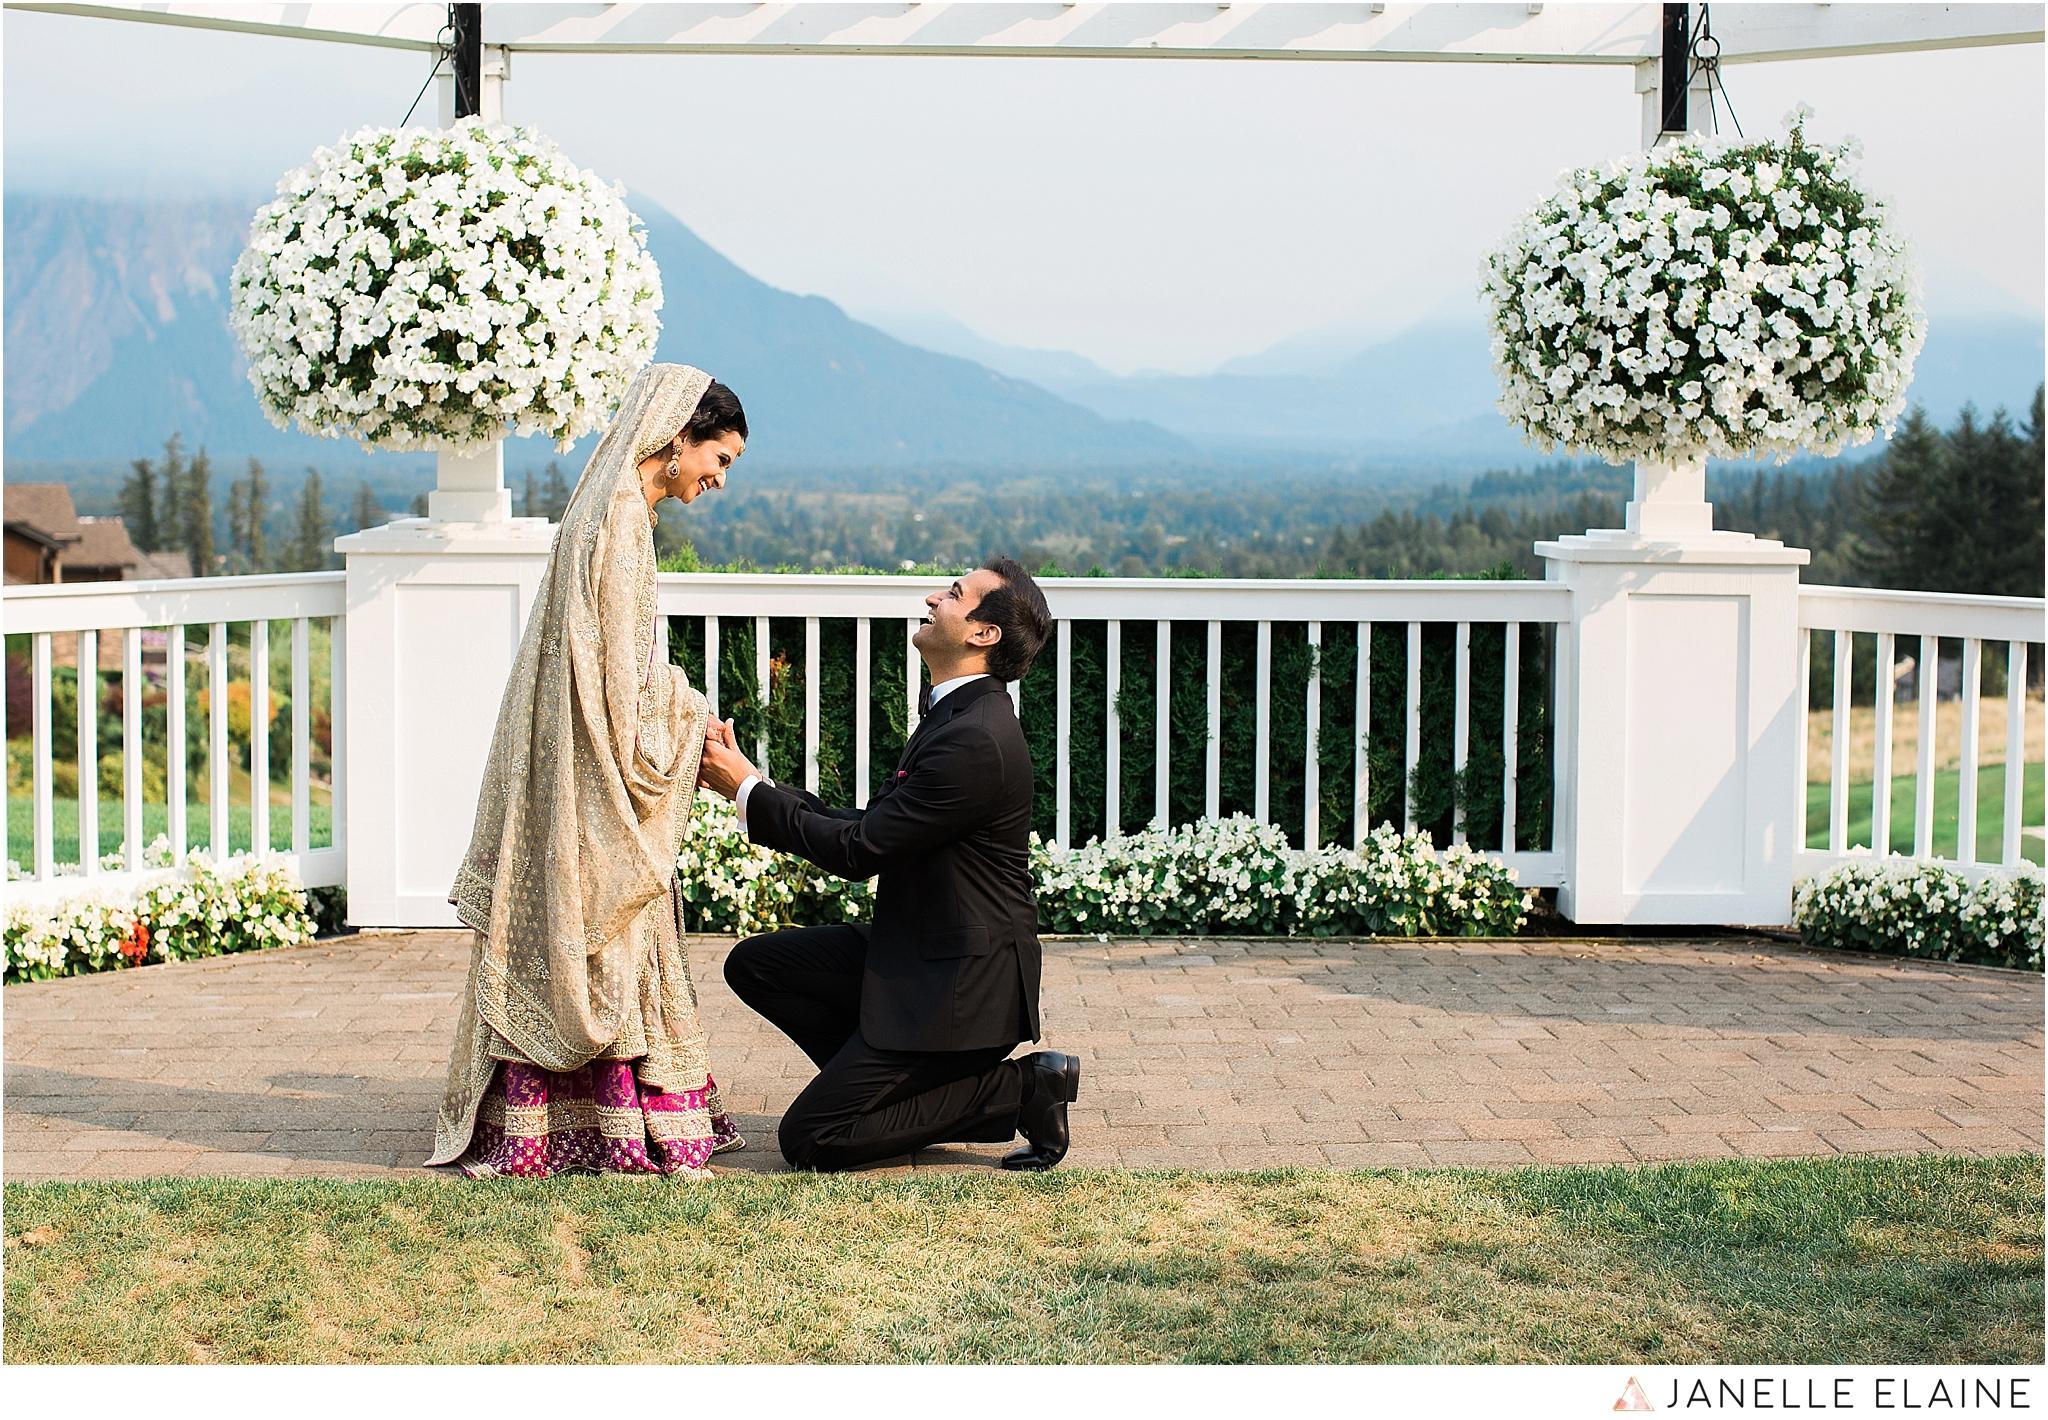 janelle elaine photography-the club at snoqualmie ridge-washington-wedding-photography-portraits-45.jpg